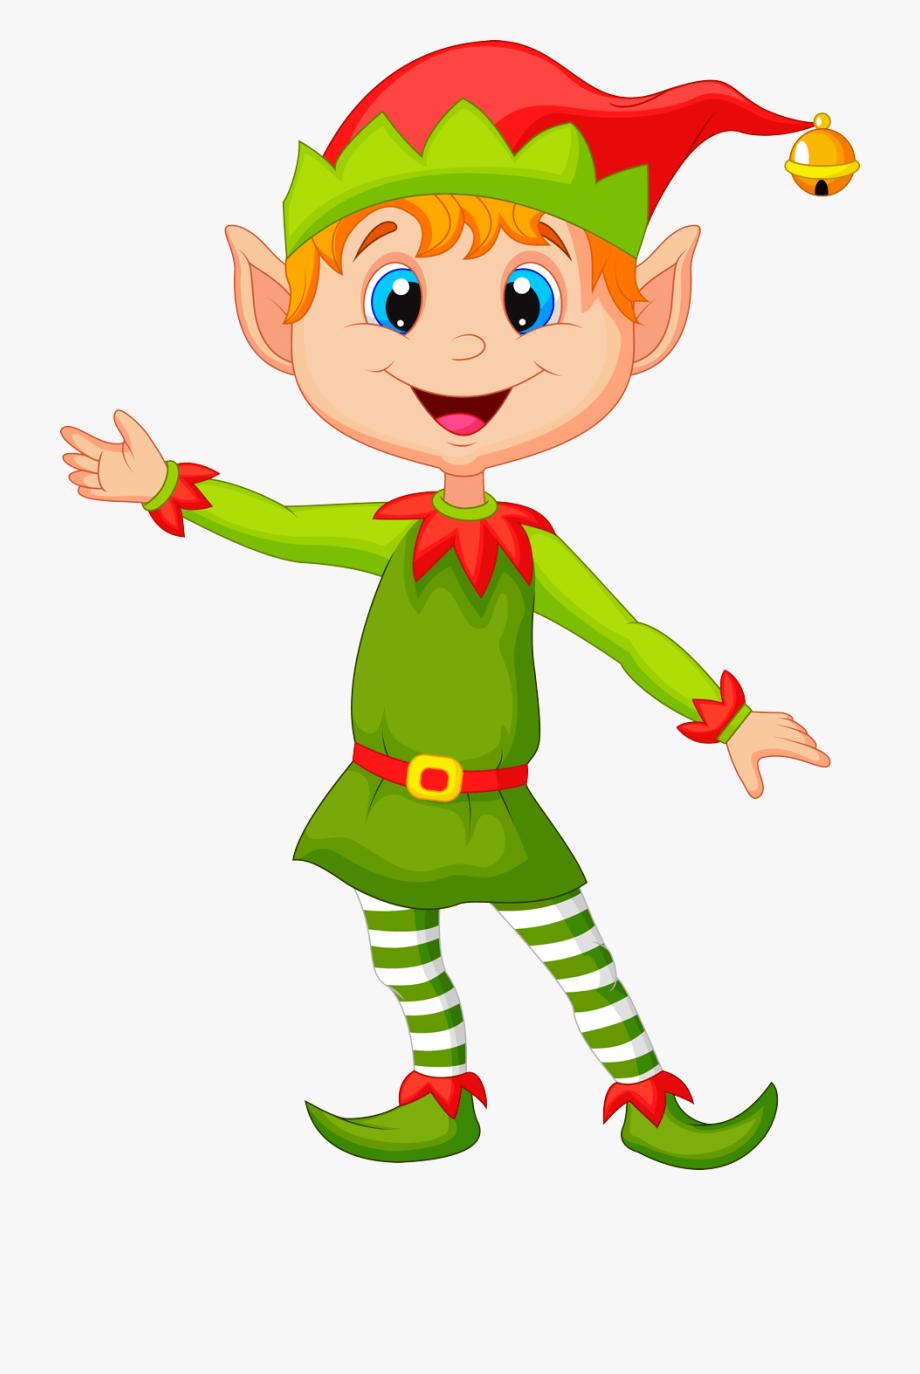 Elf png excited cartoon. Elves clipart boy